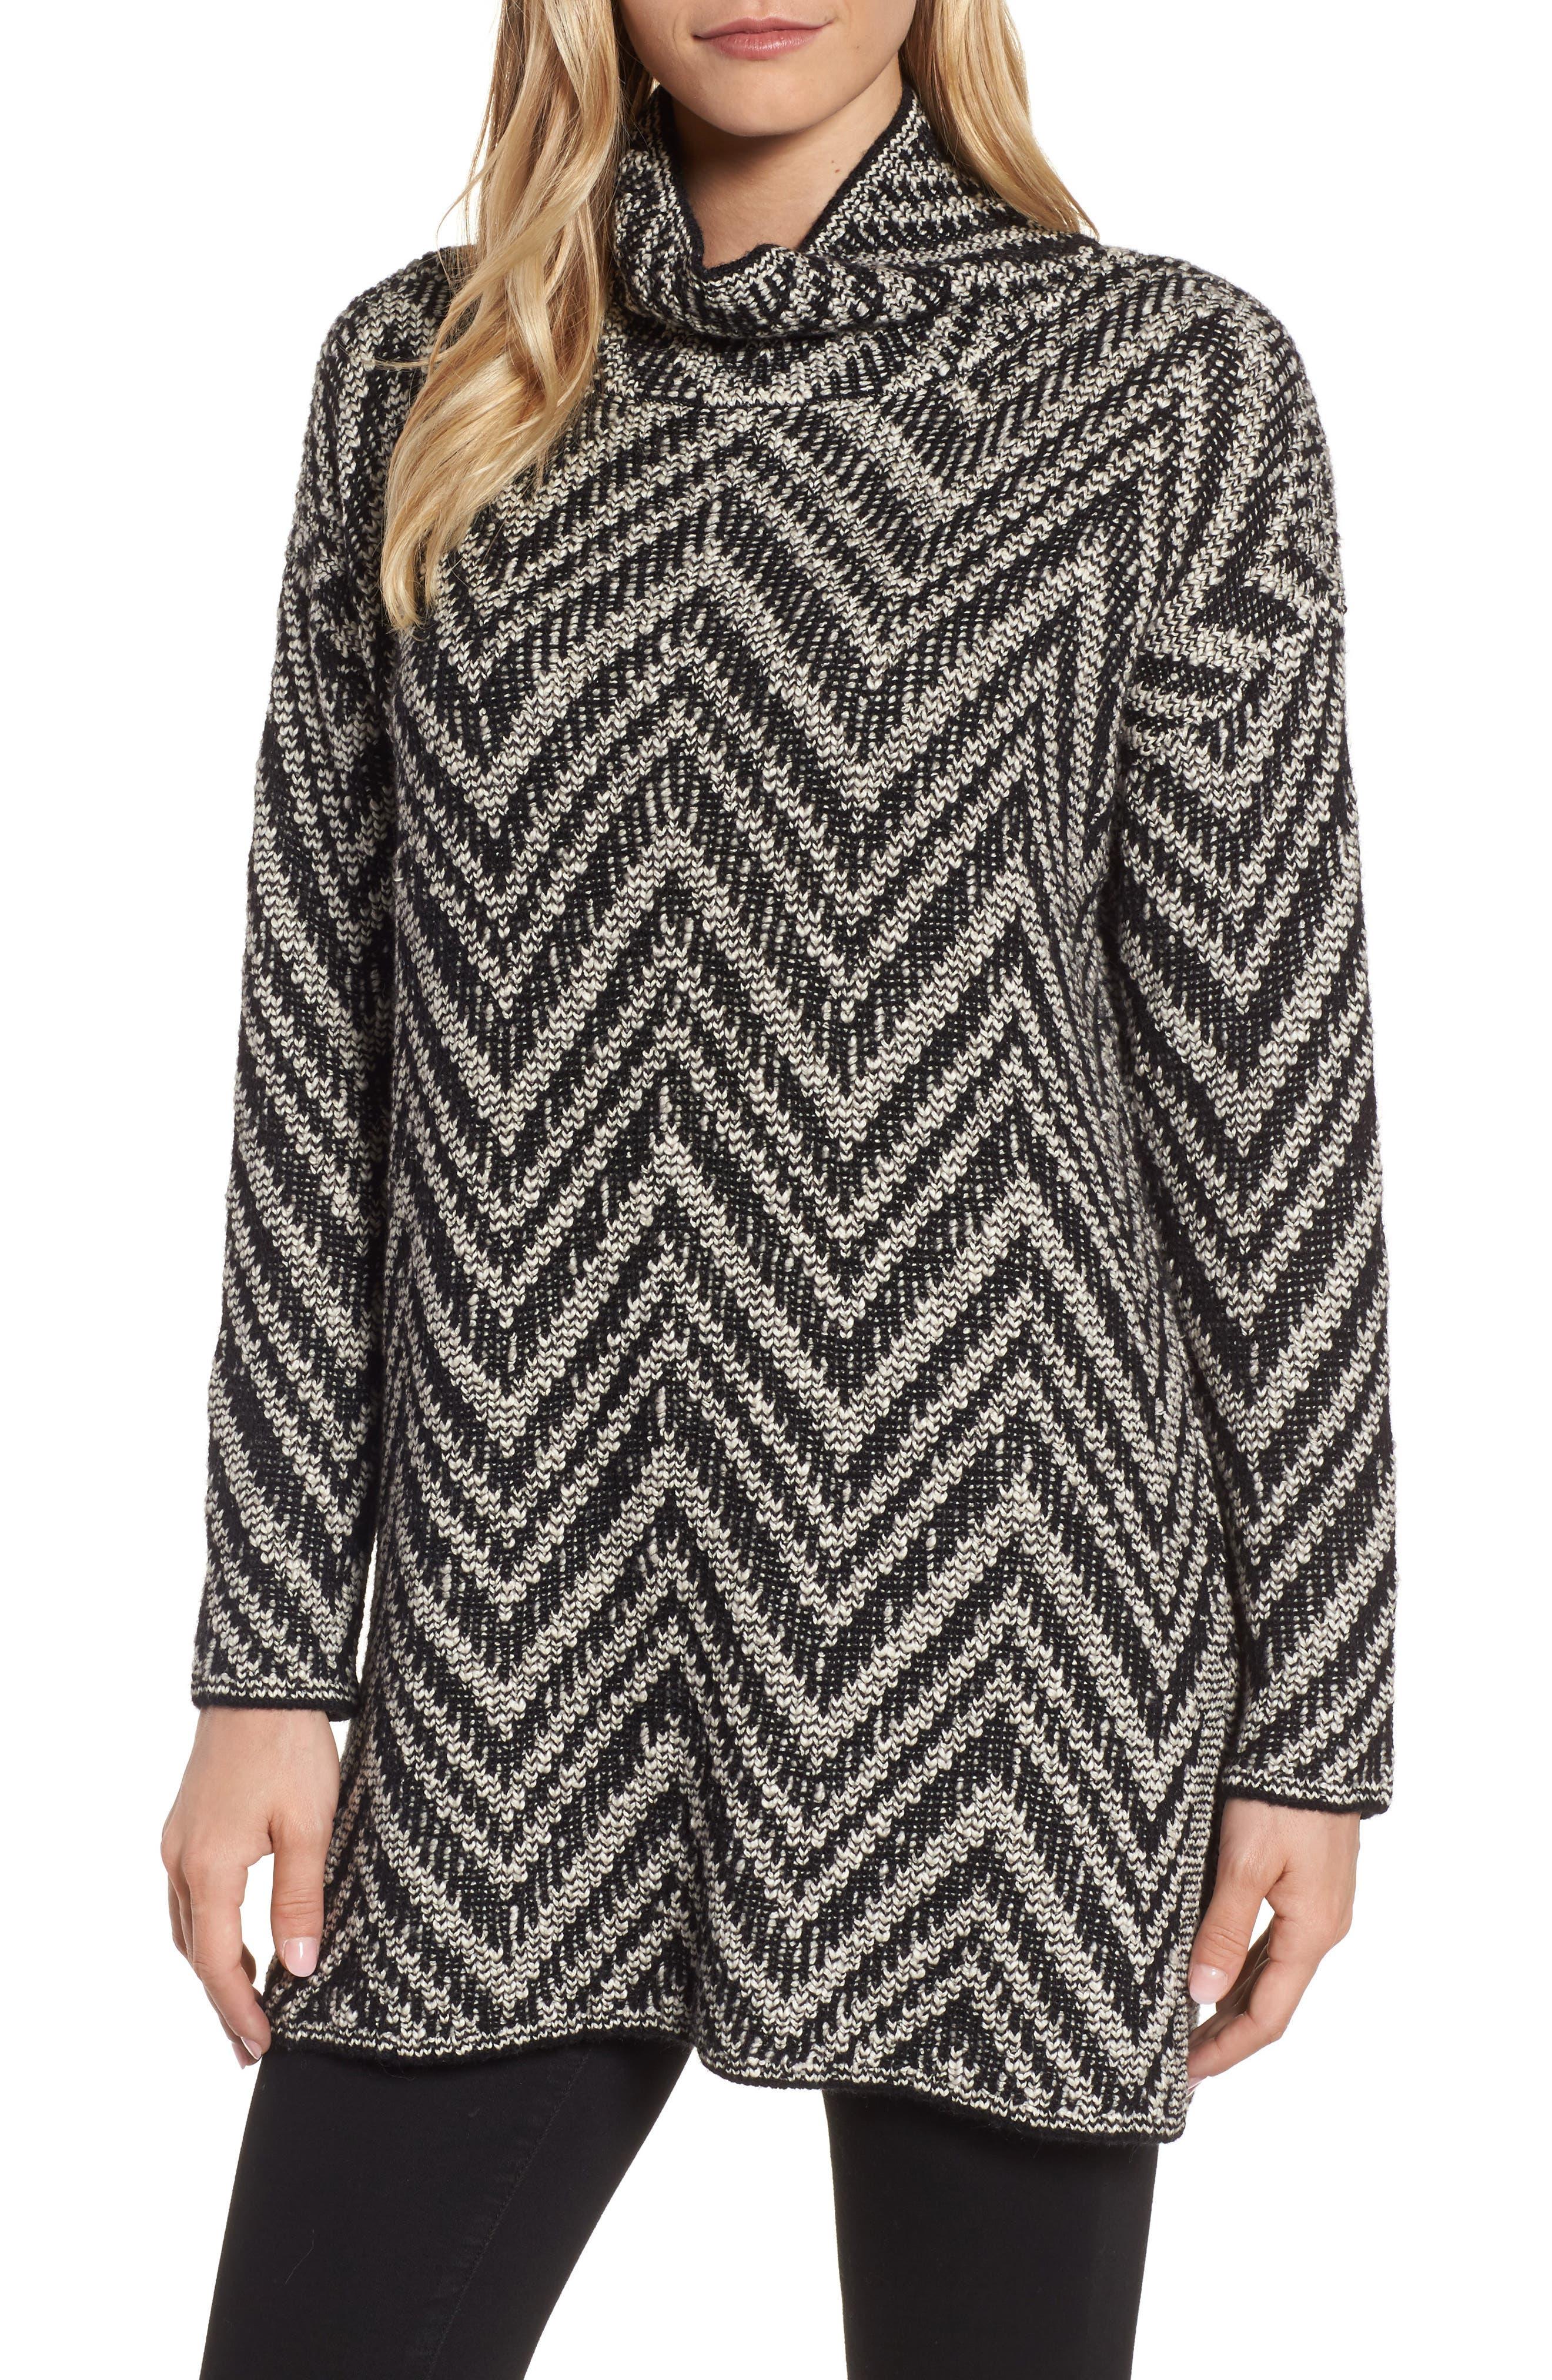 Zigzag Organic Cotton & Alpaca Tunic Sweater,                             Main thumbnail 1, color,                             Black/ Soft White